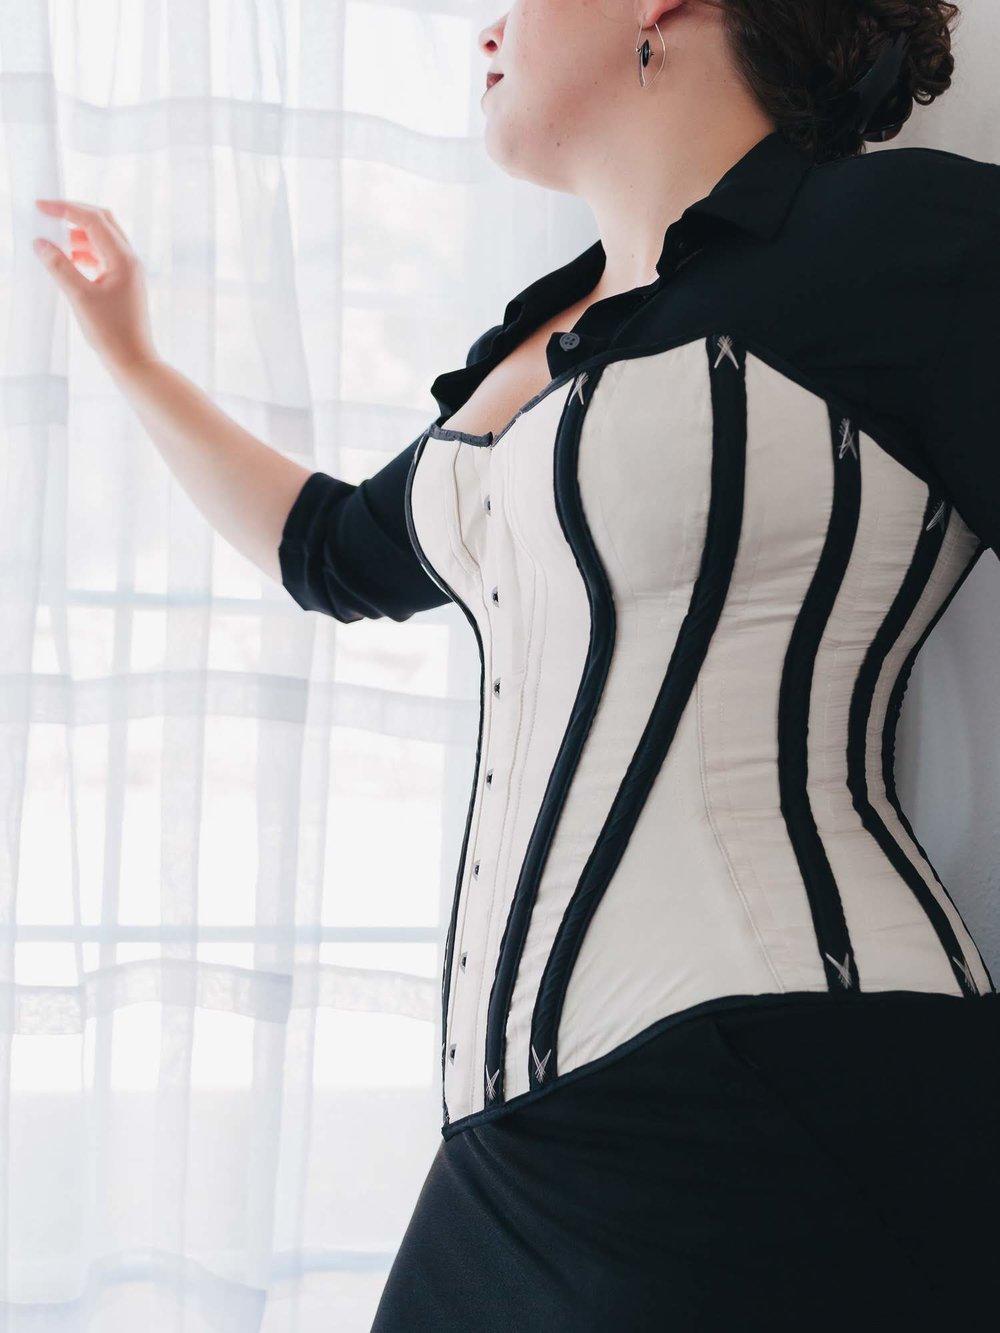 black-and-white-bespoke-corset.jpg